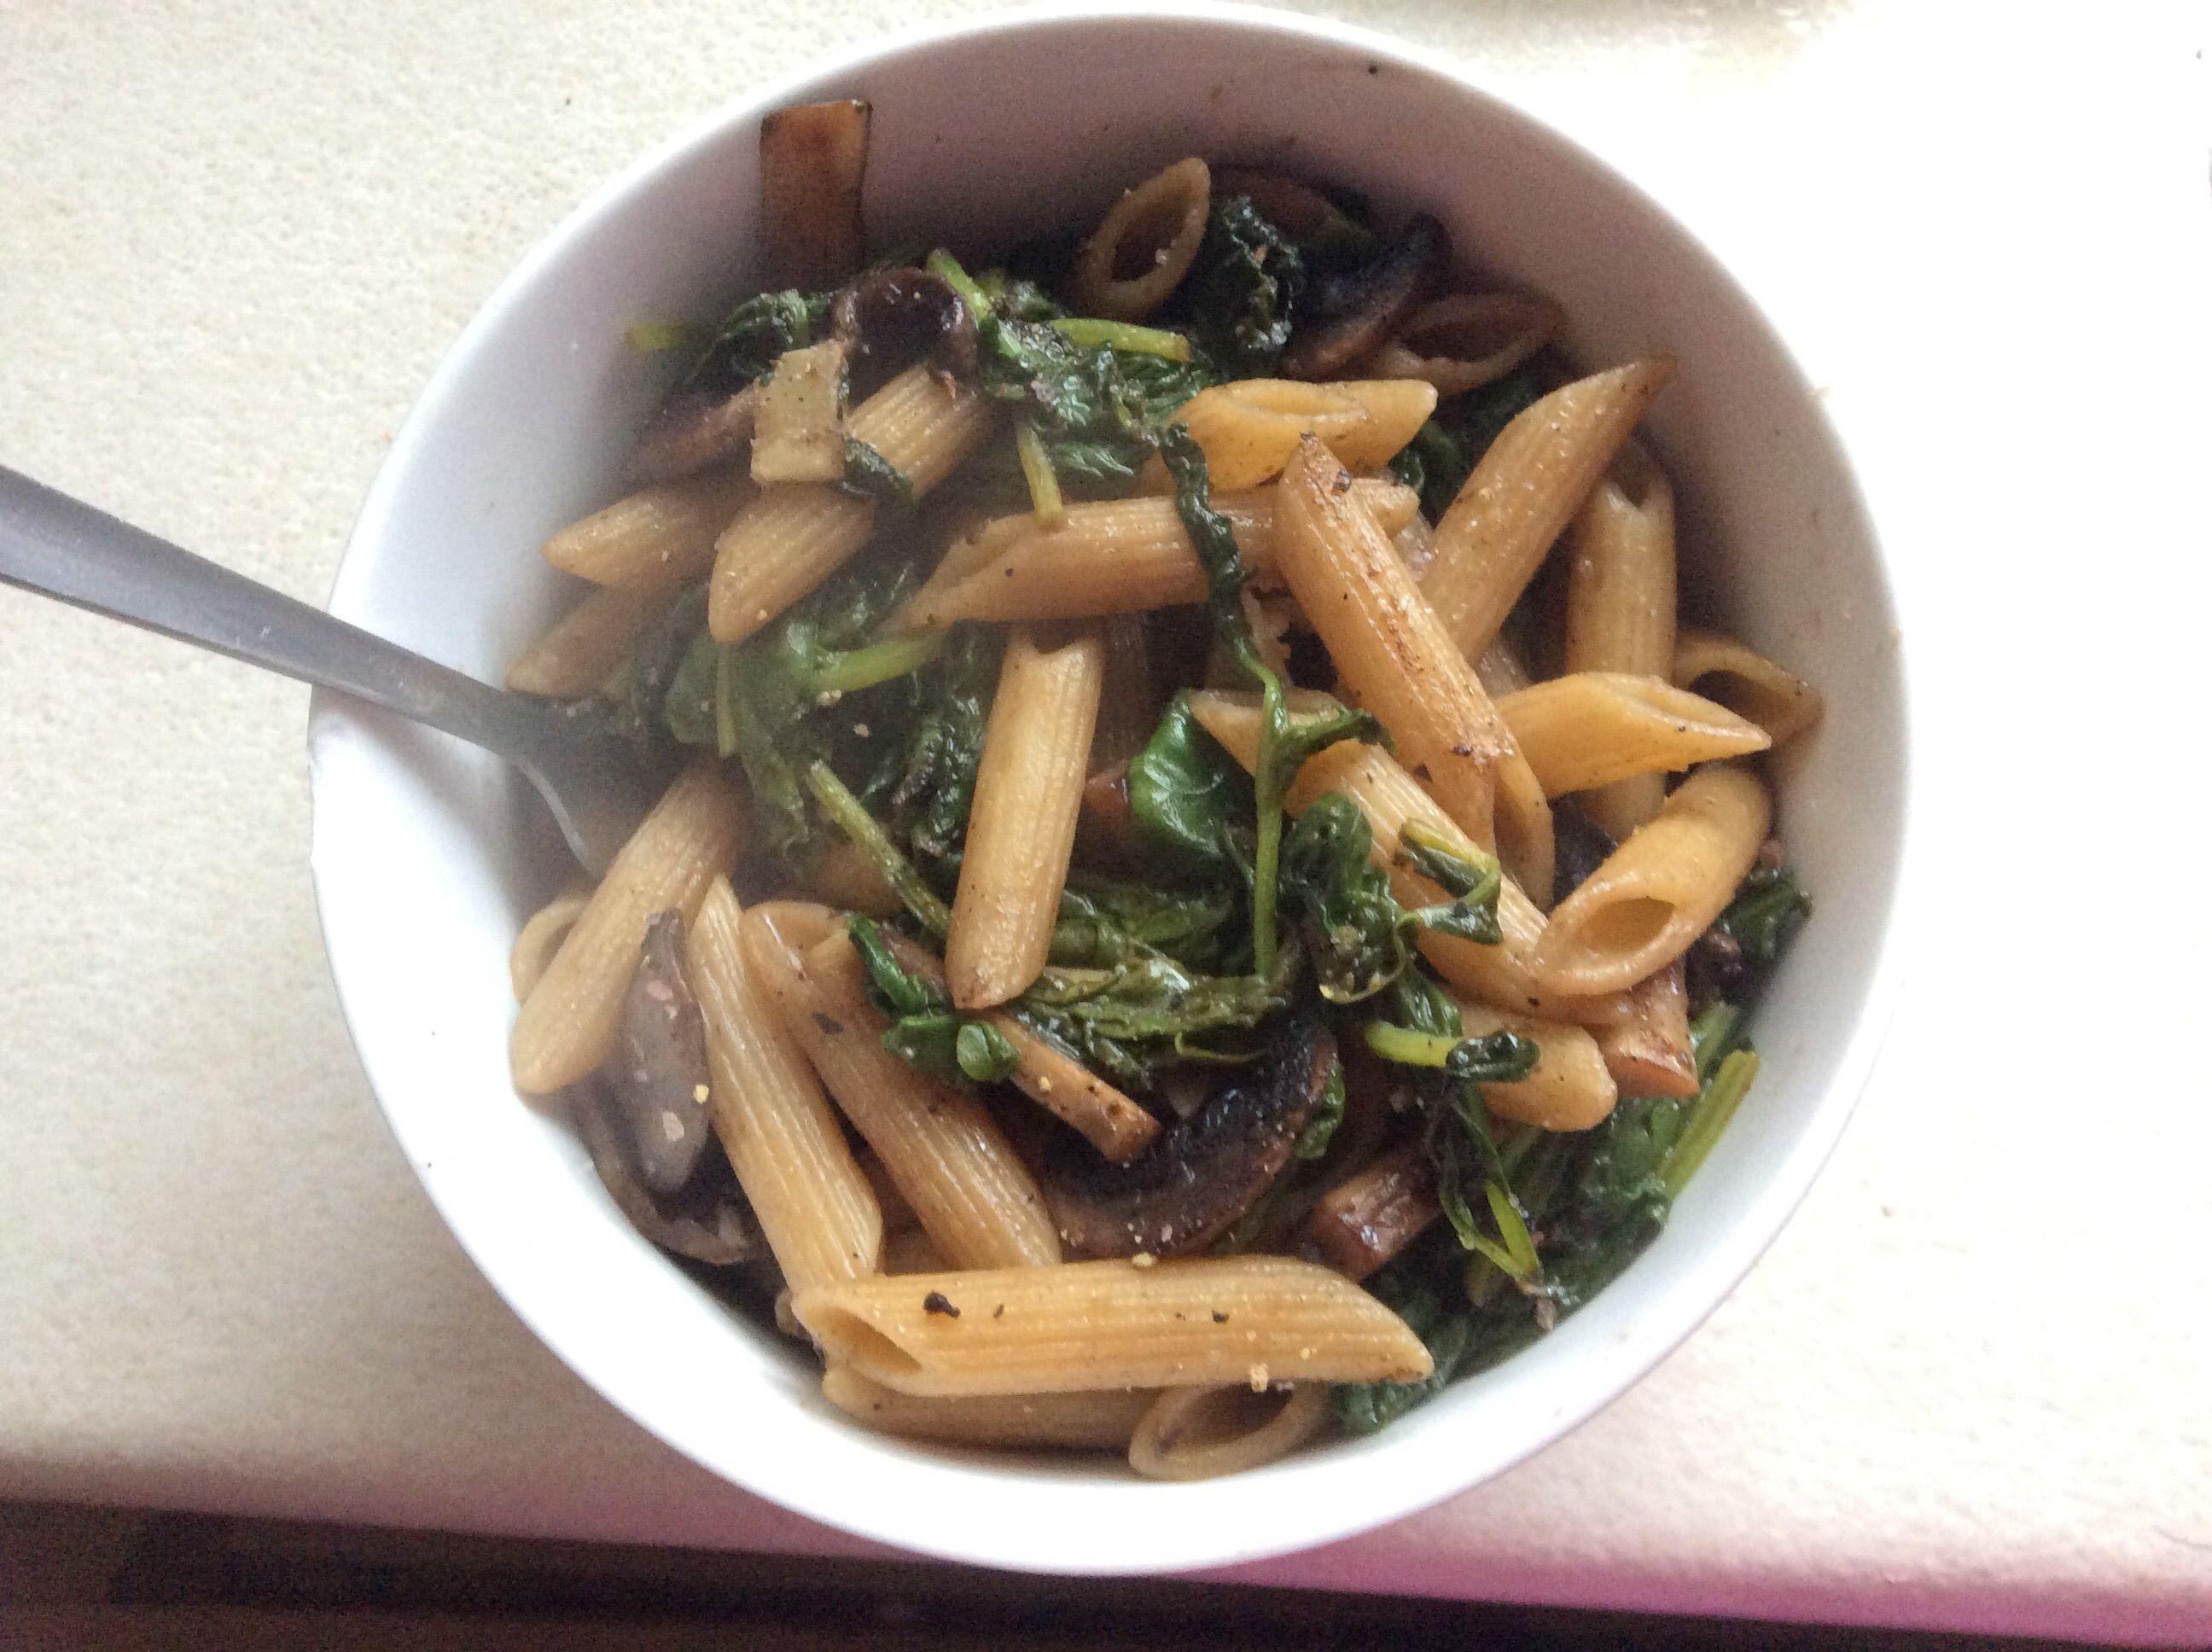 Vegan Pasta with Spinach, Mushrooms, and Garlic